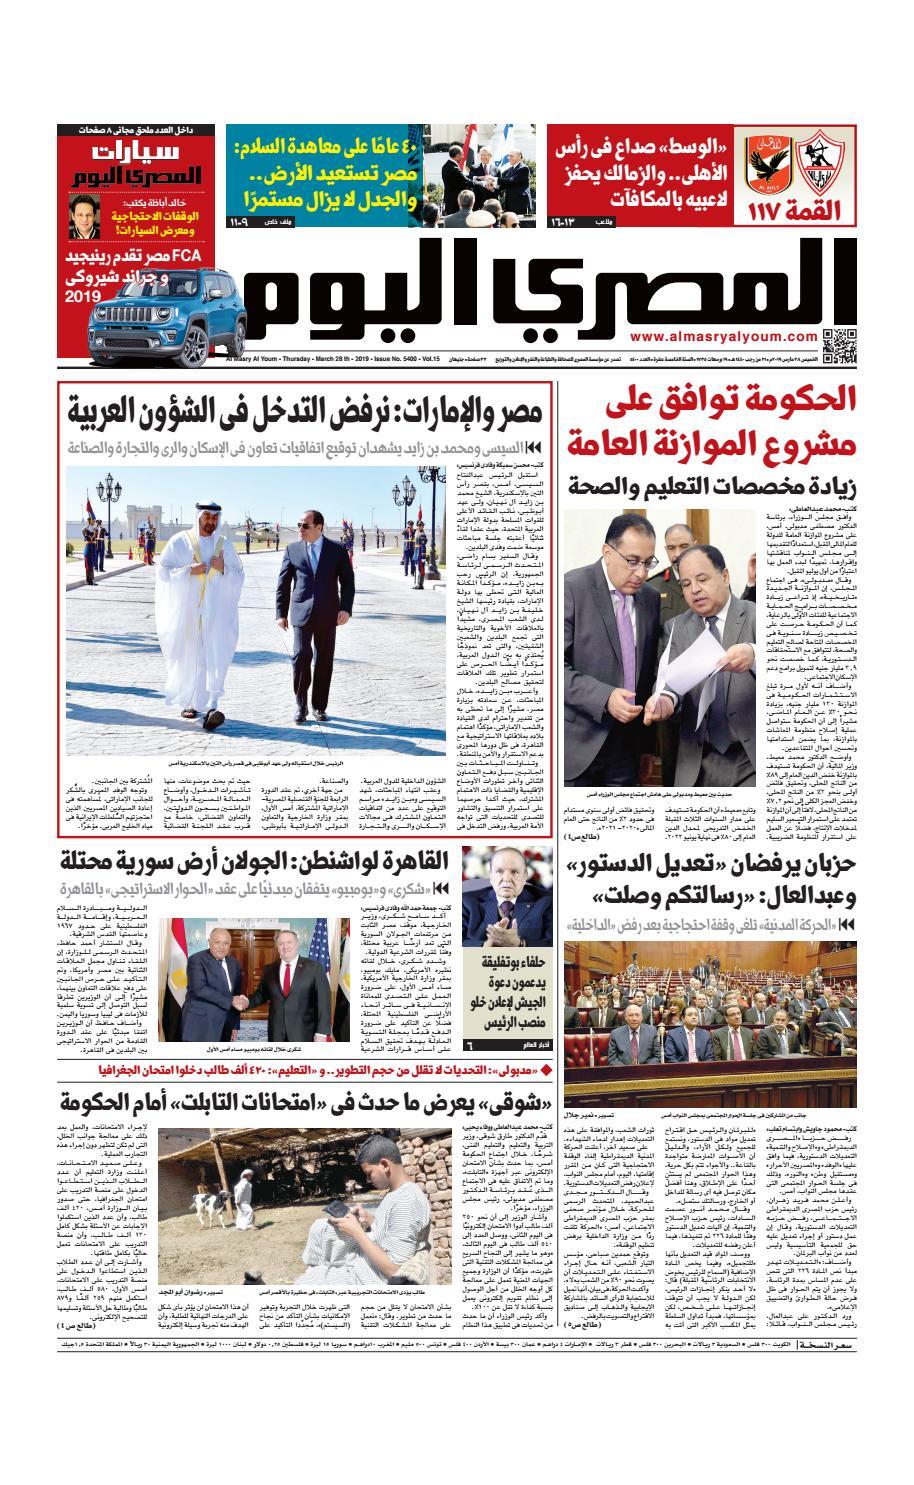 daa19e258b2f5 عدد الخميس 28 3 2019 by Al Masry Media Corp - issuu